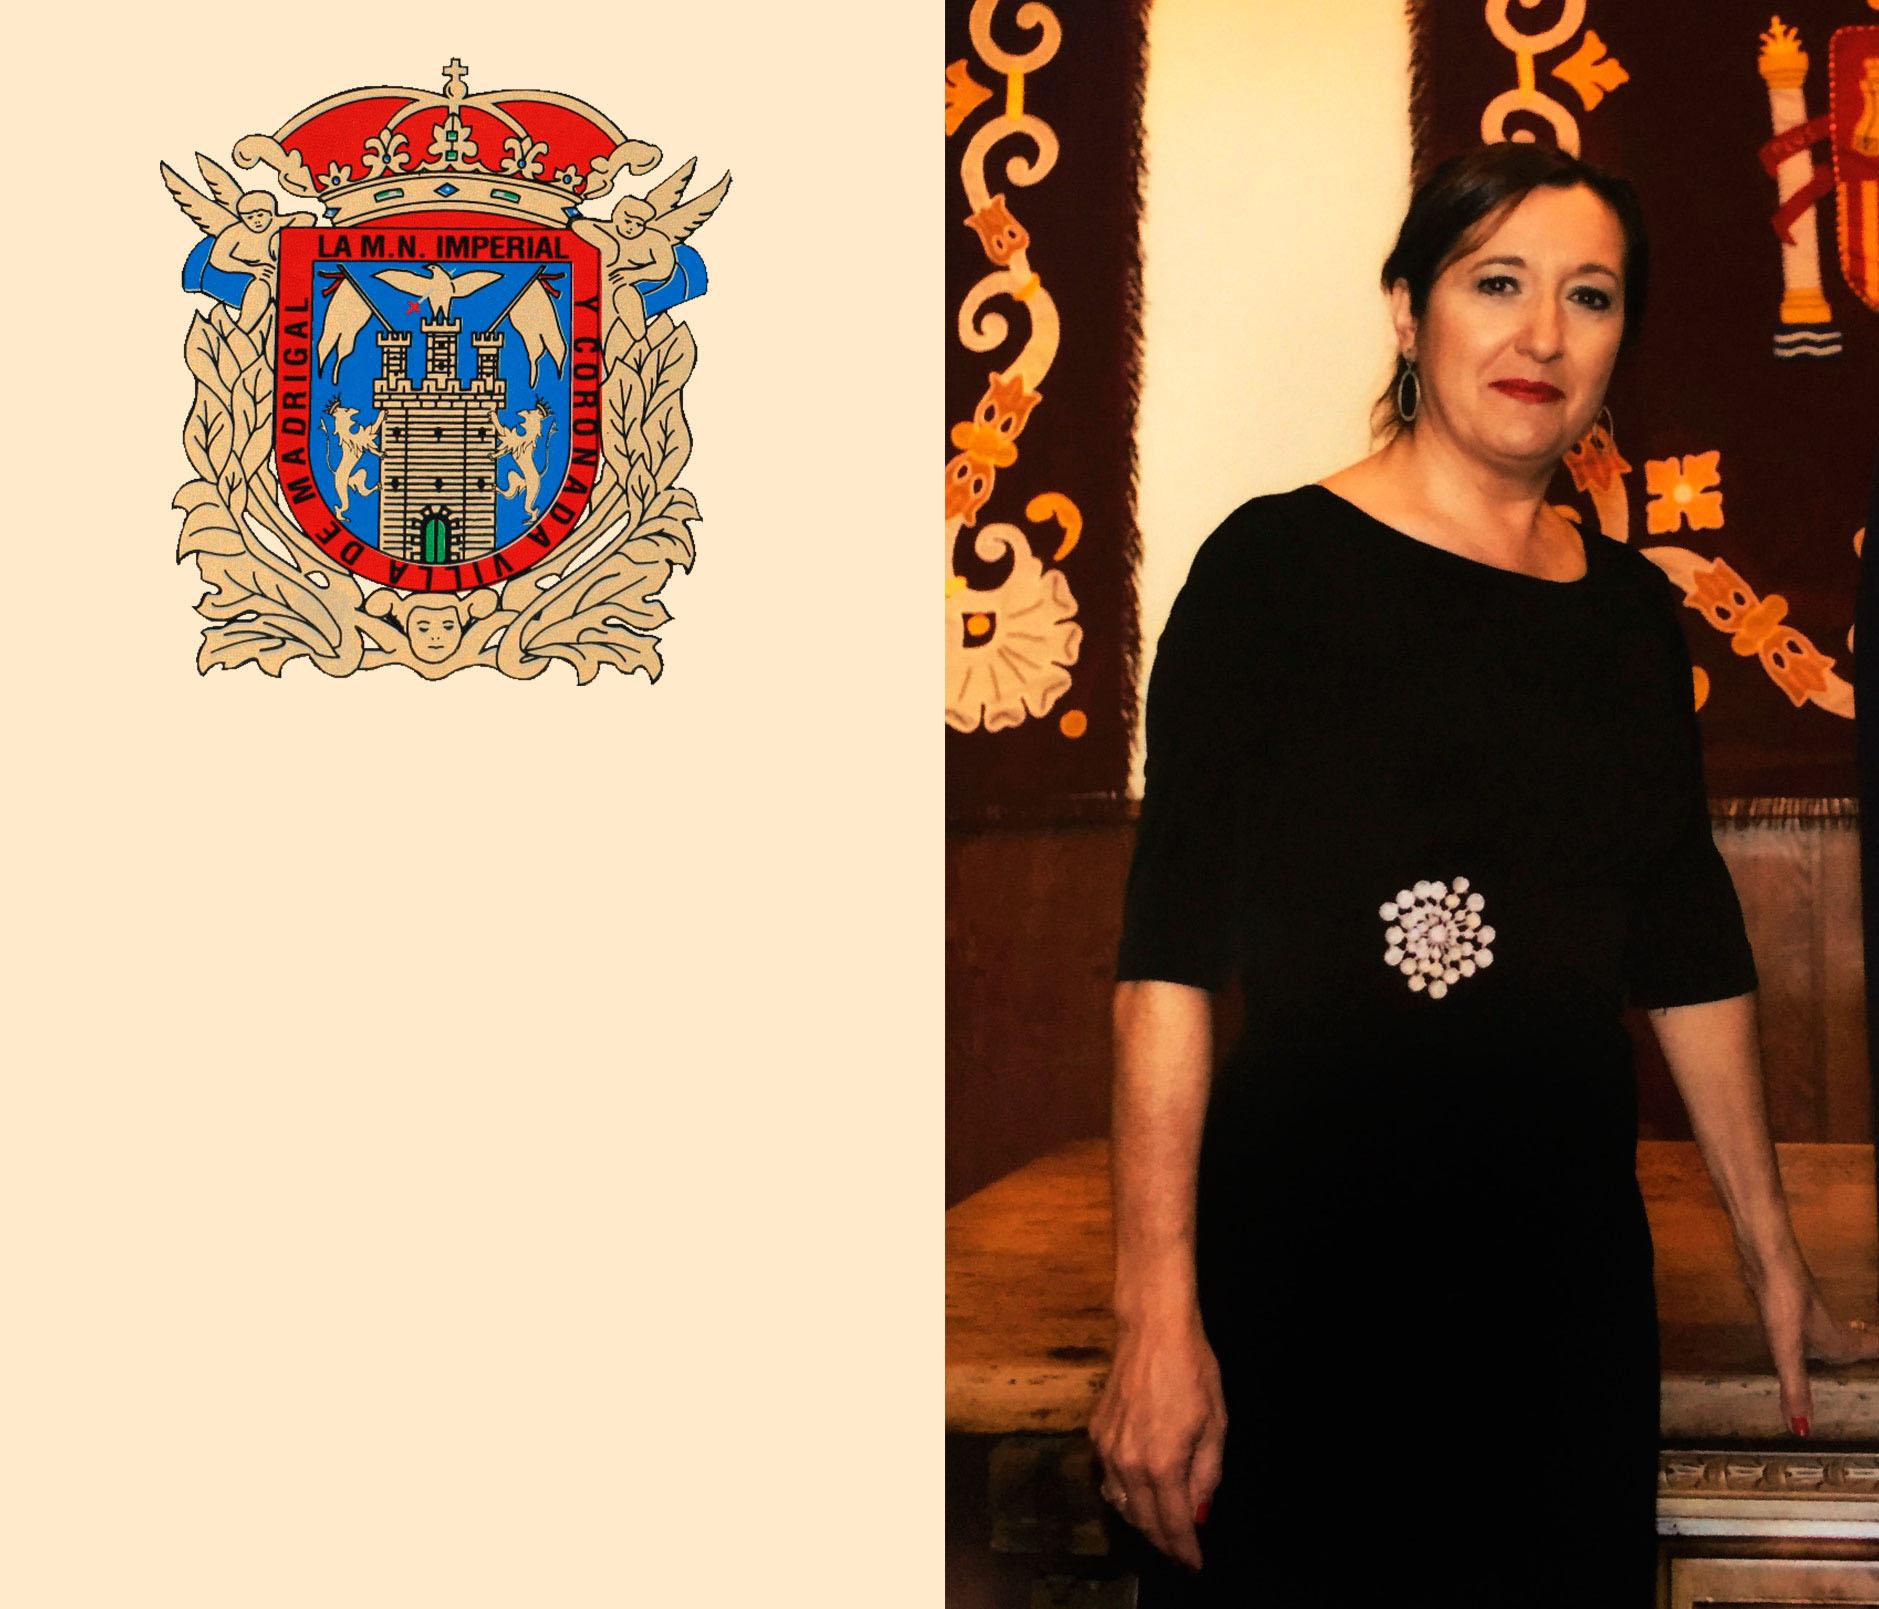 saluda_alcaldesa_01